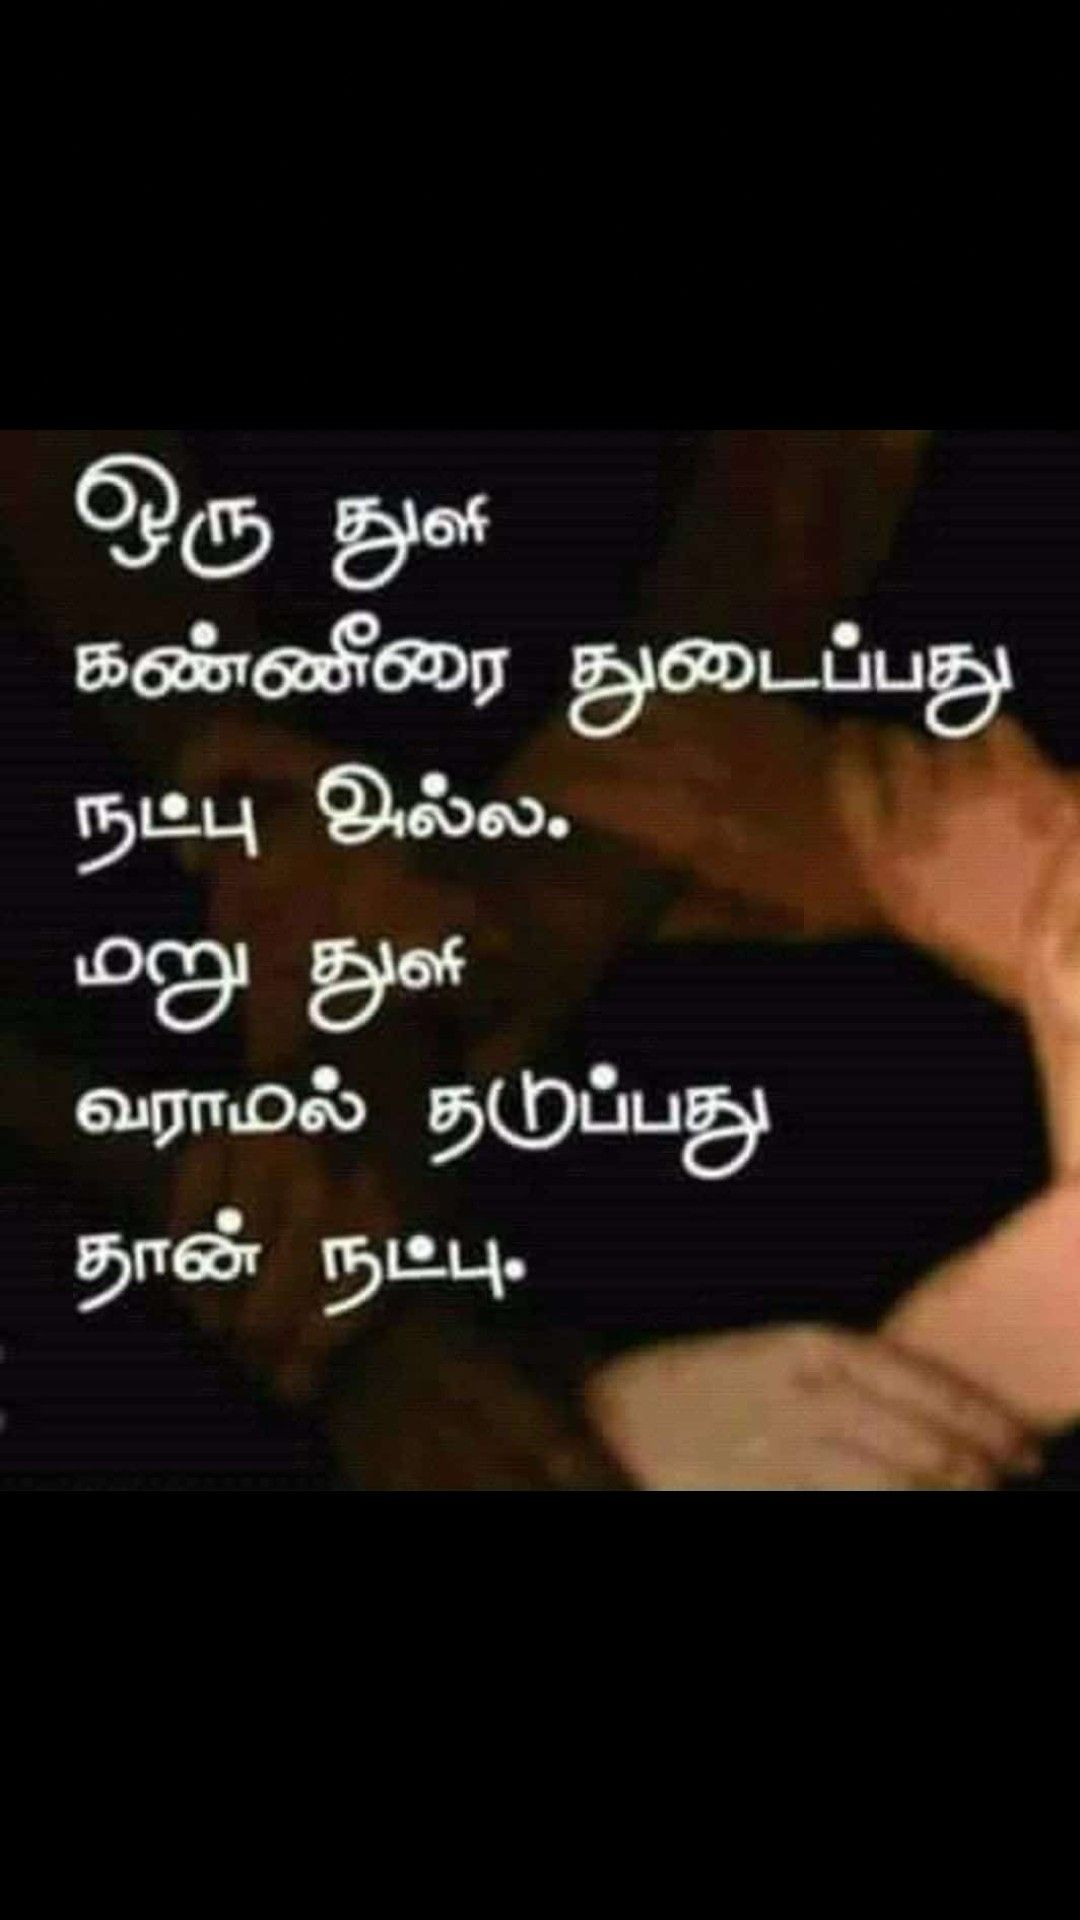 traurige gedichte in tamil uber die liebe